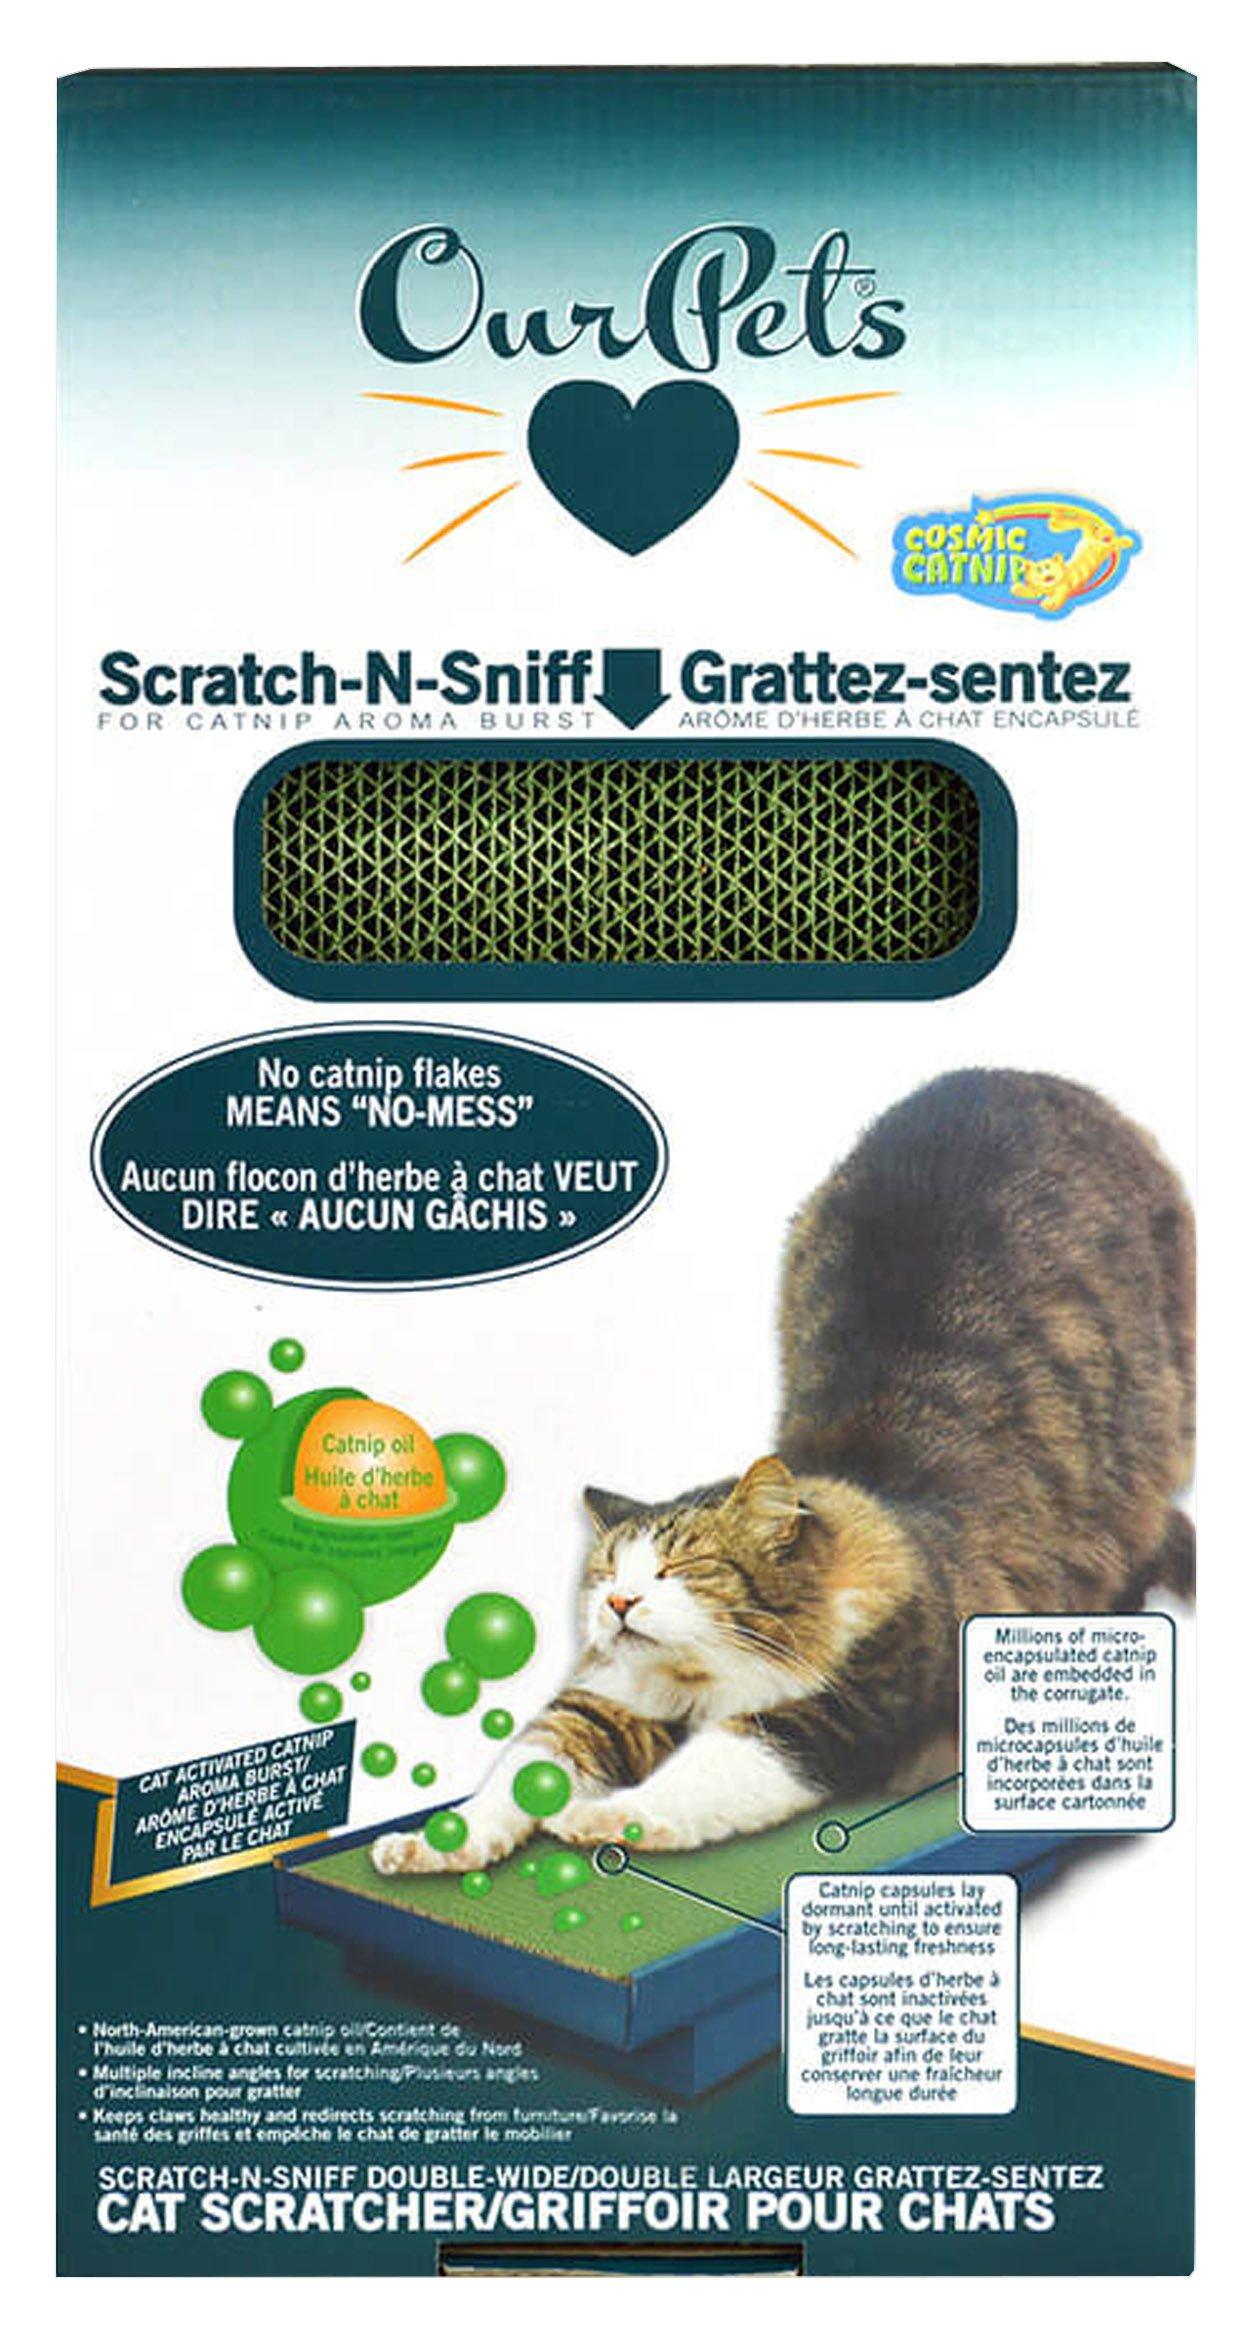 OurPets Scratch-N-Sniff Cat Scratcher Microencapsulation Catnip Oil No Mess Scratching Pad